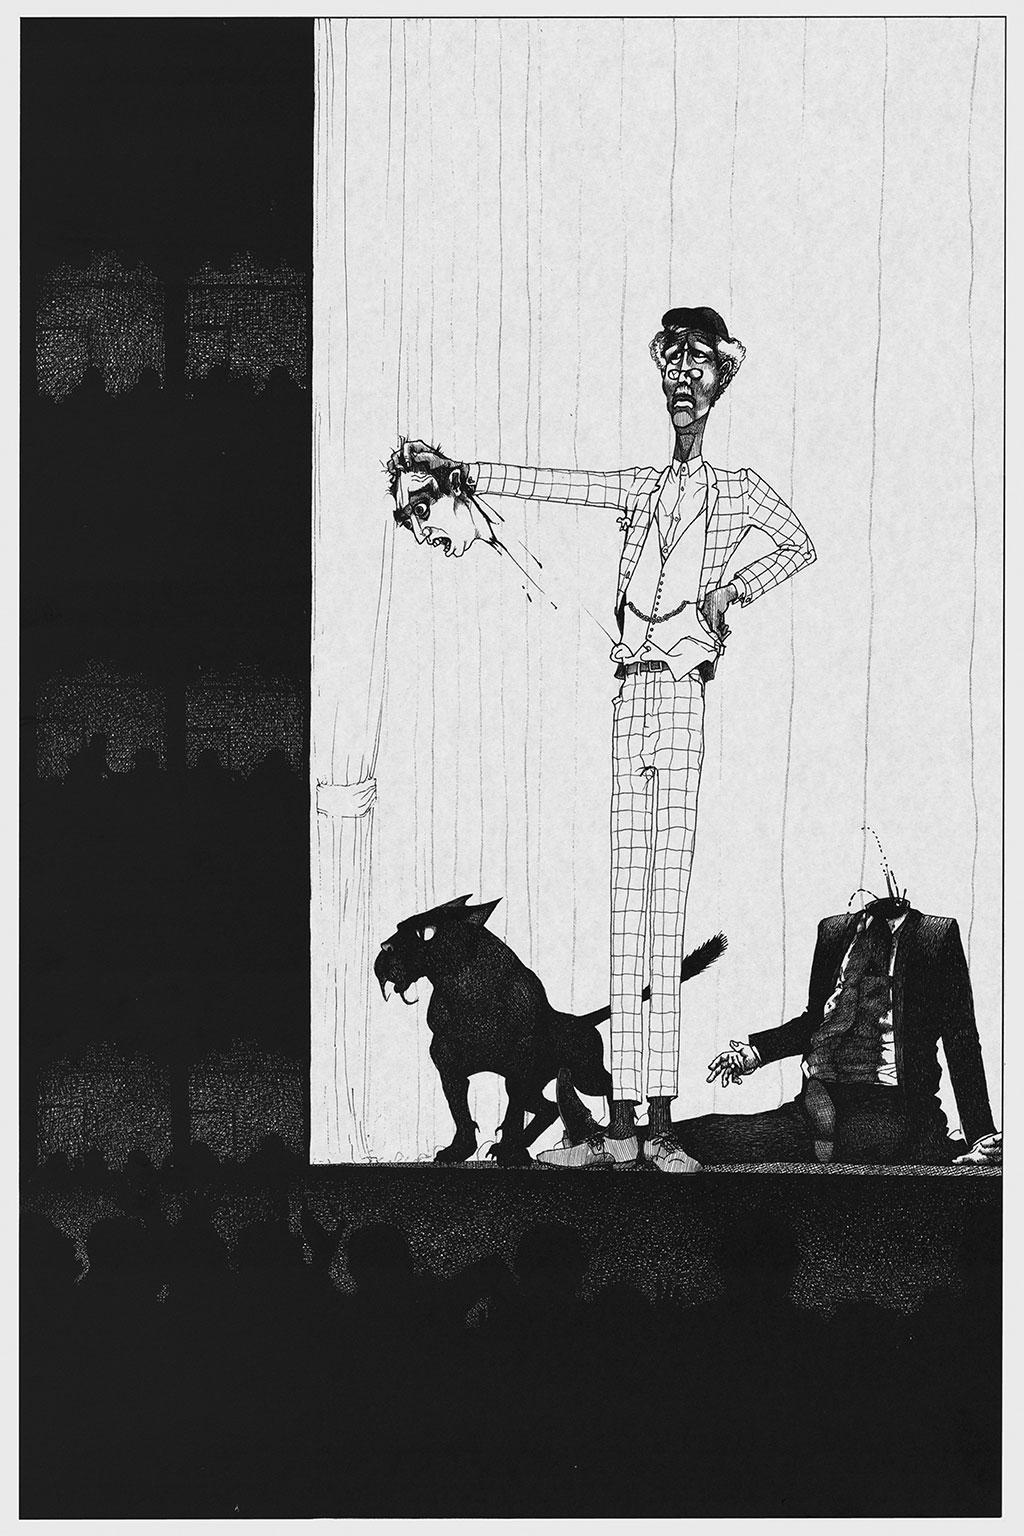 Иллюстрация Мастер и Маргарита Чарли Стоун 7